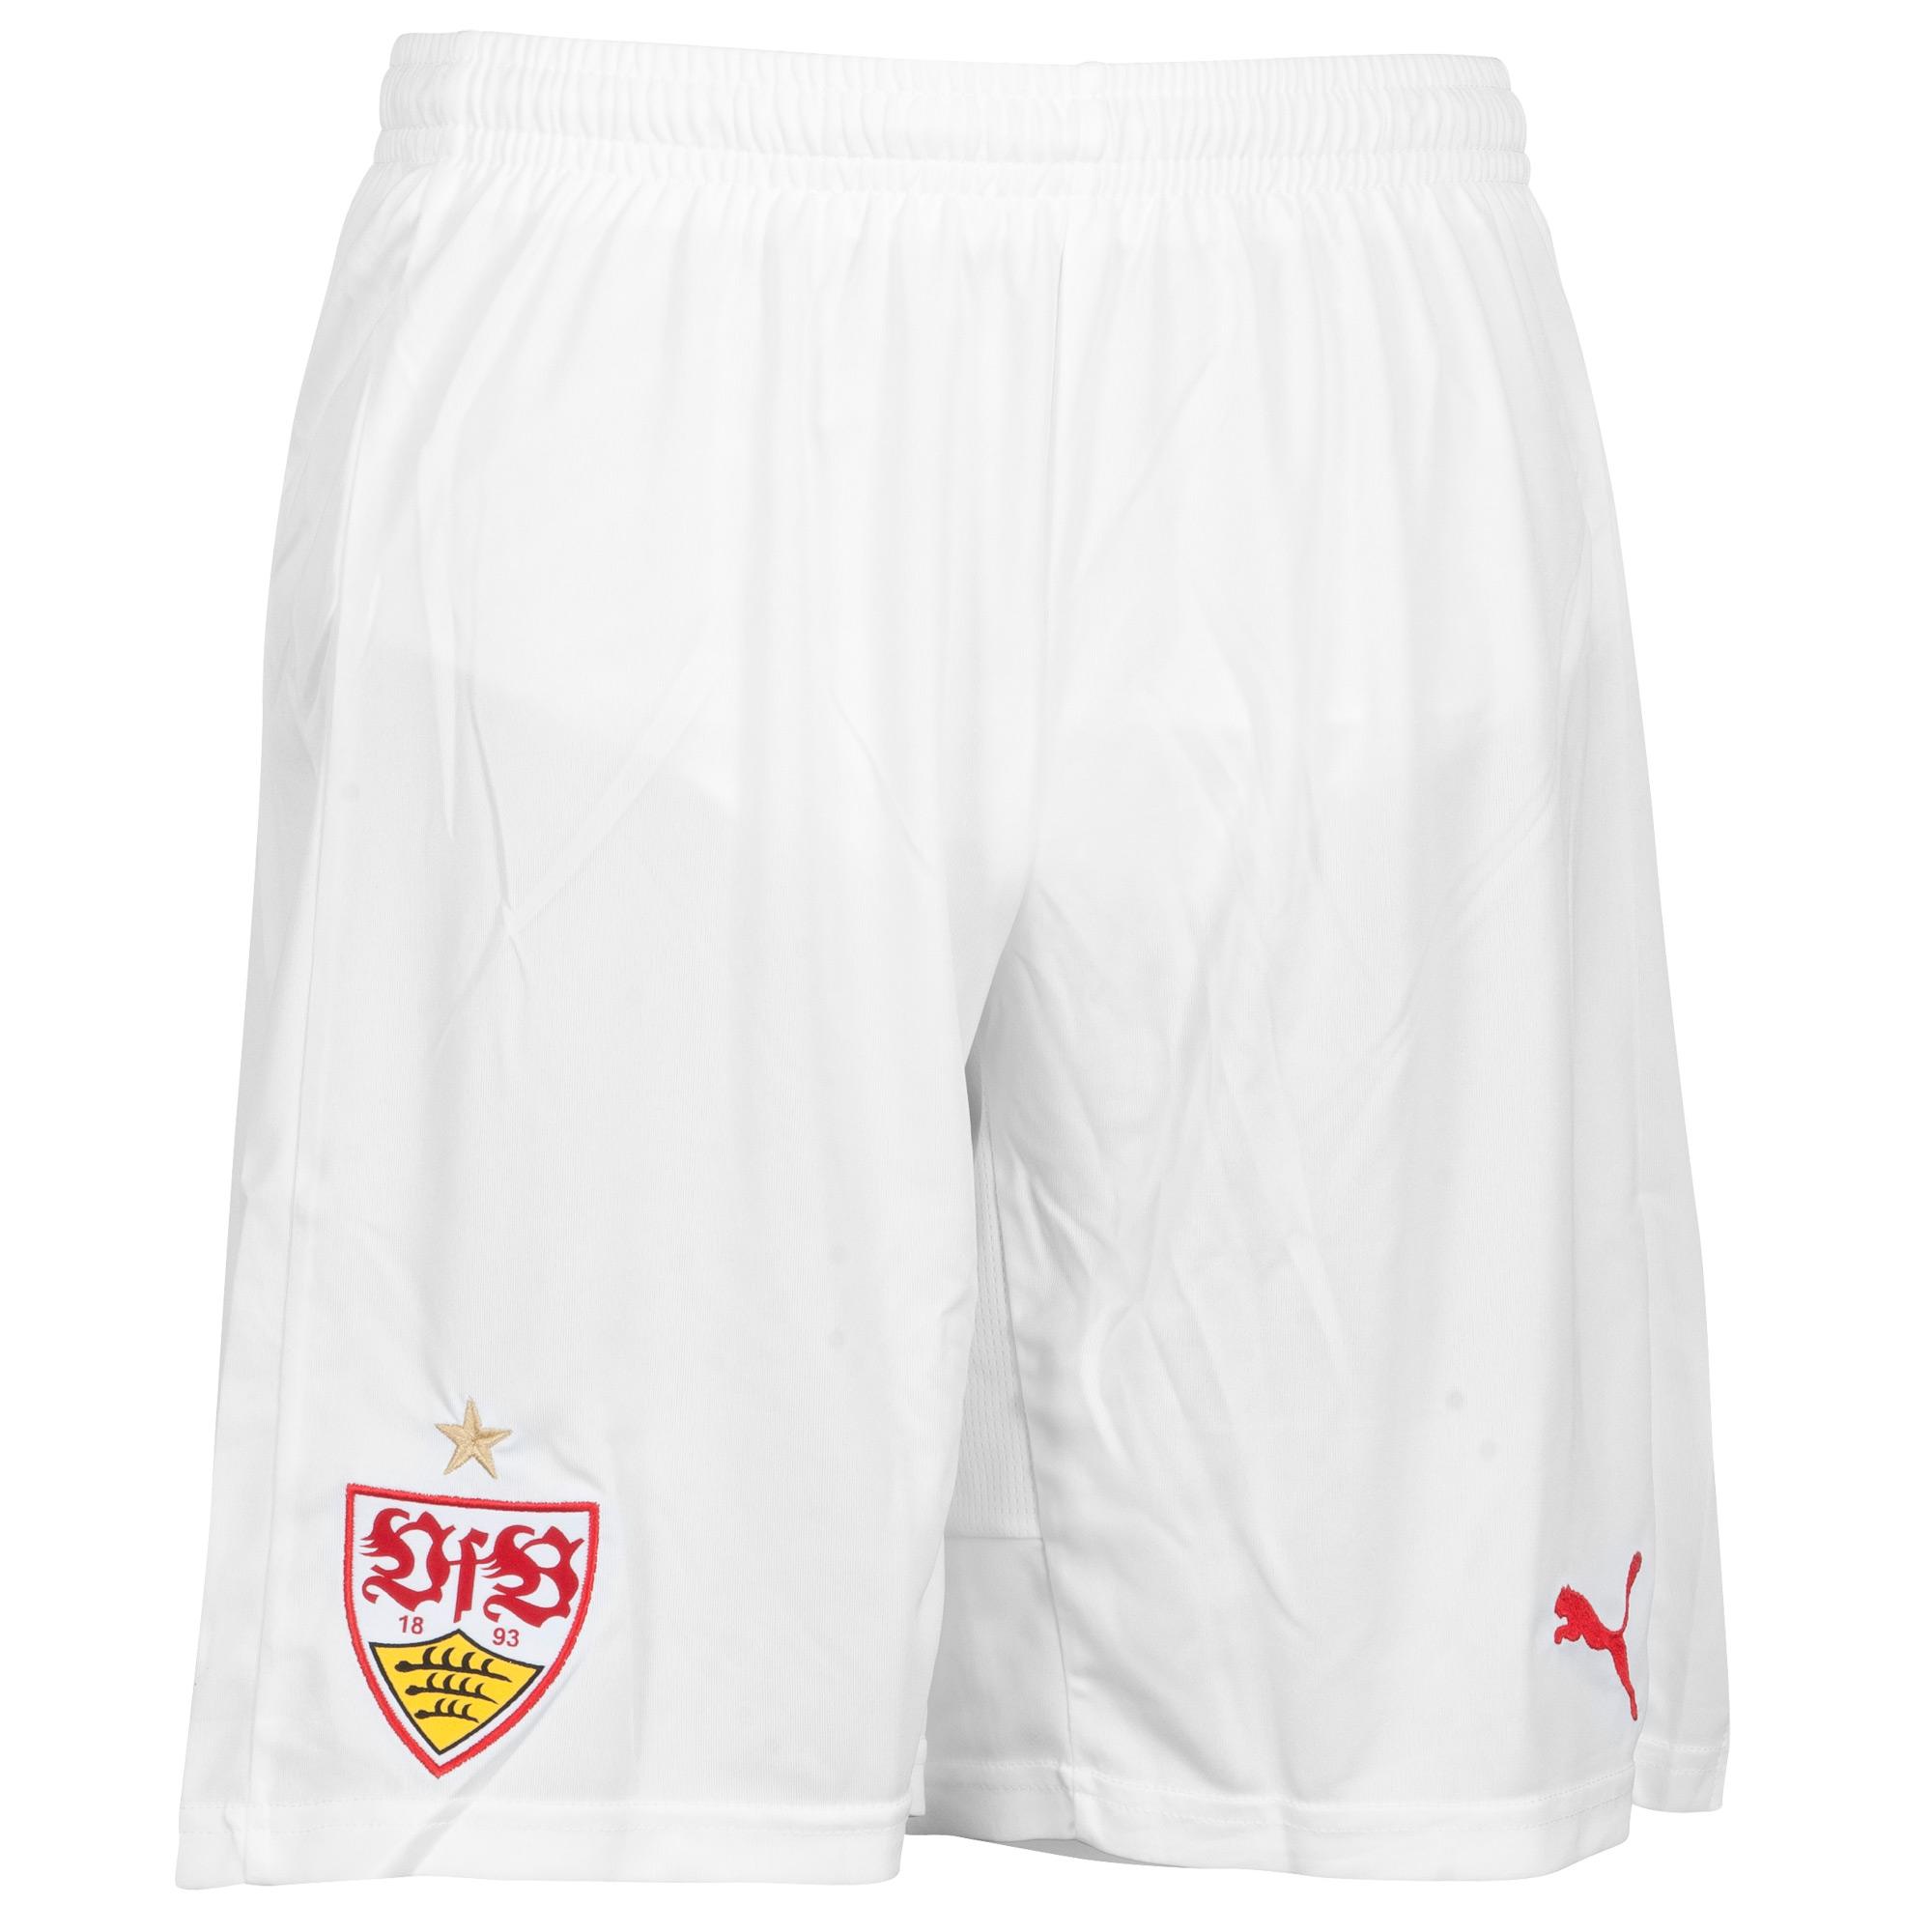 VFB Stuttgart Home Shorts 2015 / 2016 - M